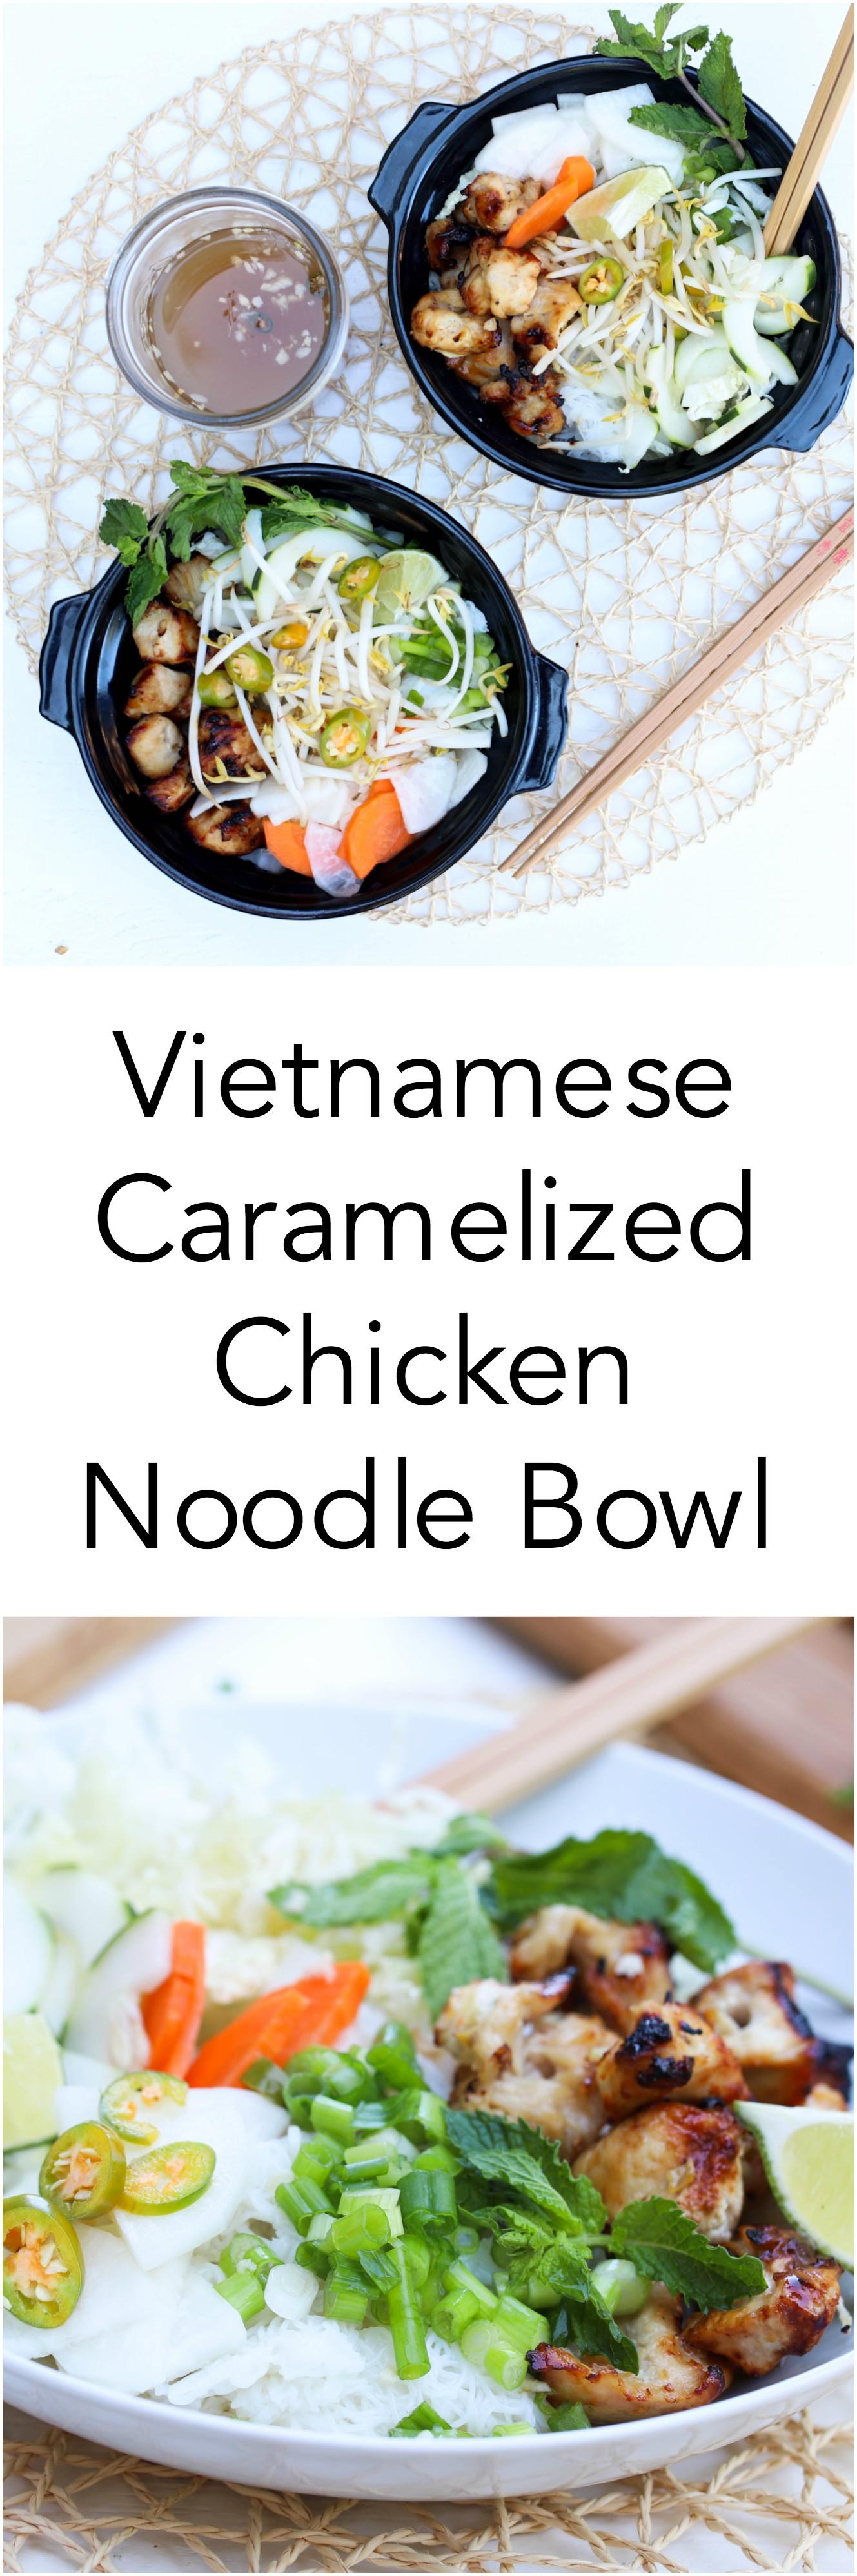 Vietnamese Caramelized Chicken Noodle Bowl.jpg